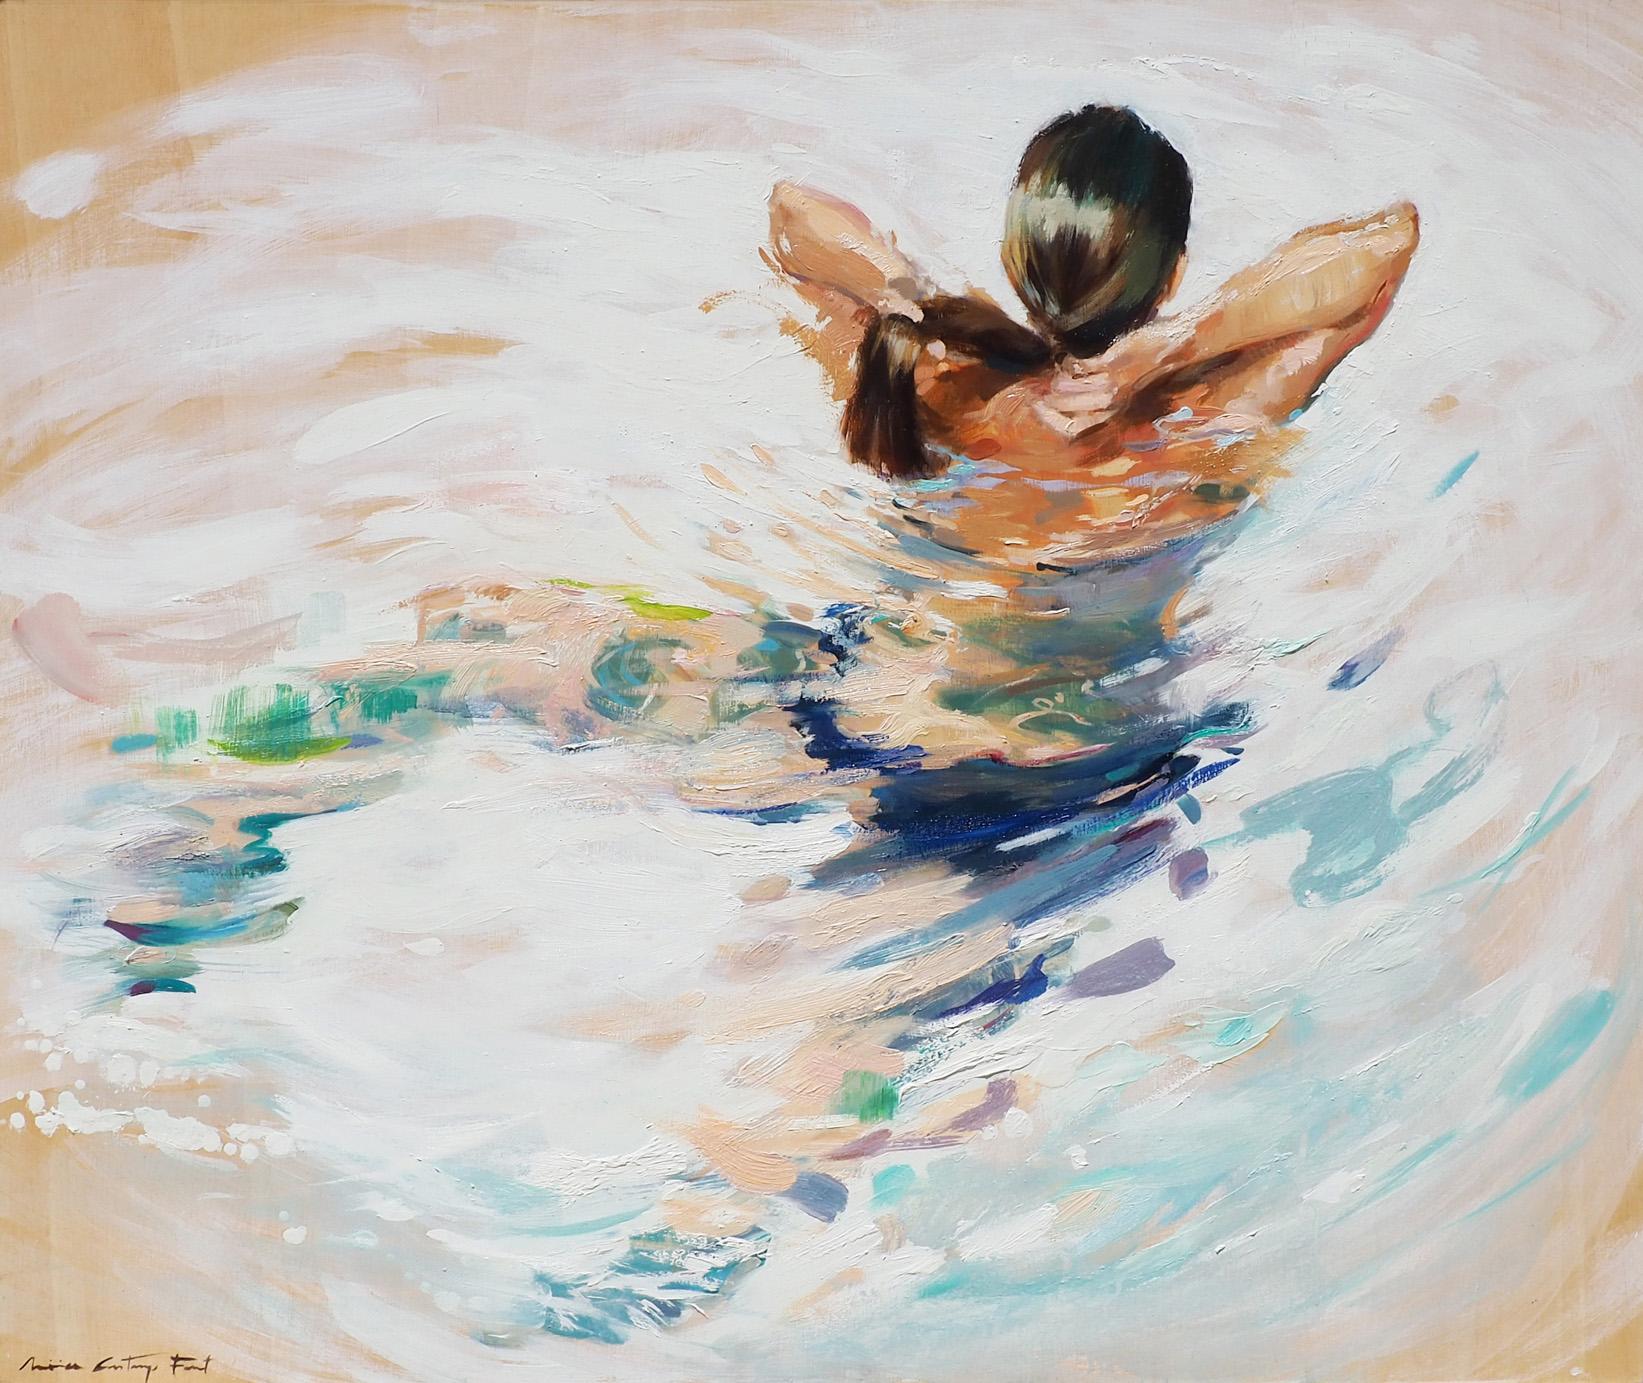 Monica Castanys, En Silenci, Anquins Gallery